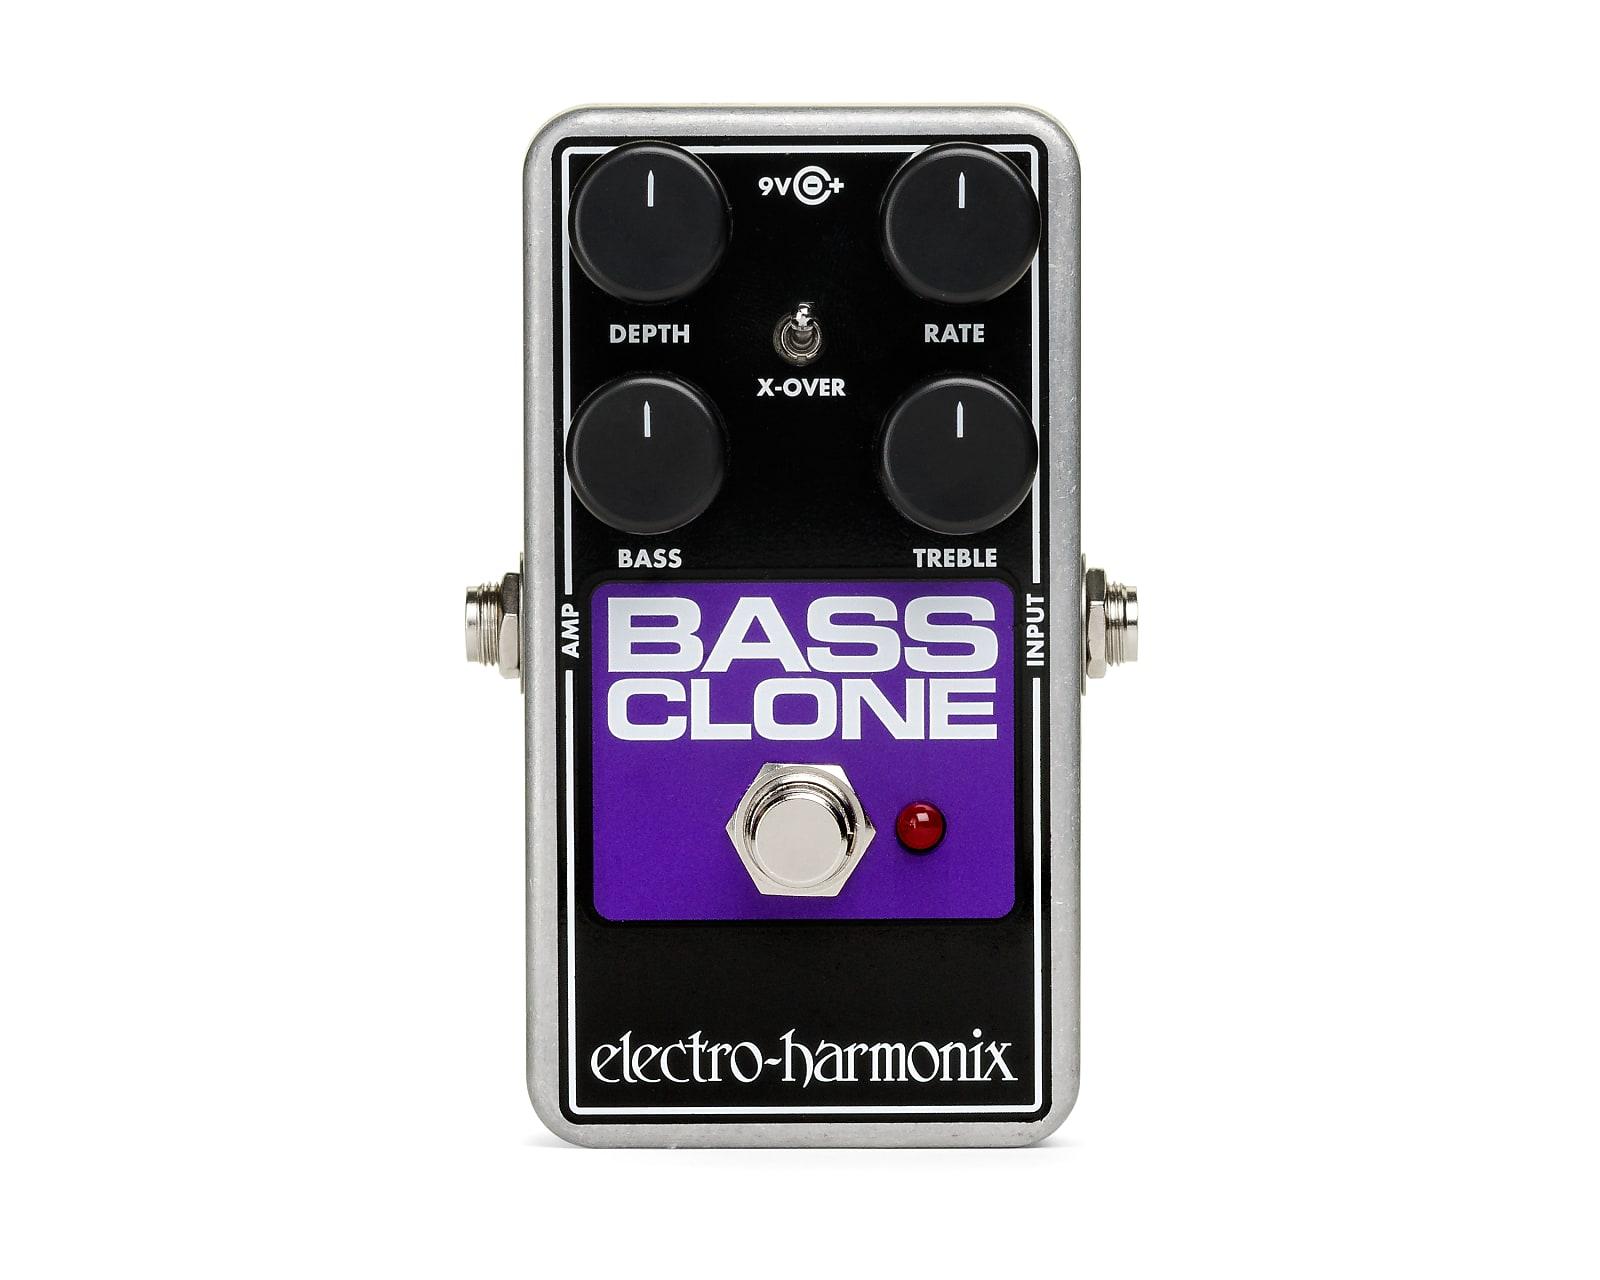 Electro-Harmonix EHX Bass Clone Analog Chorus Effects Pedal